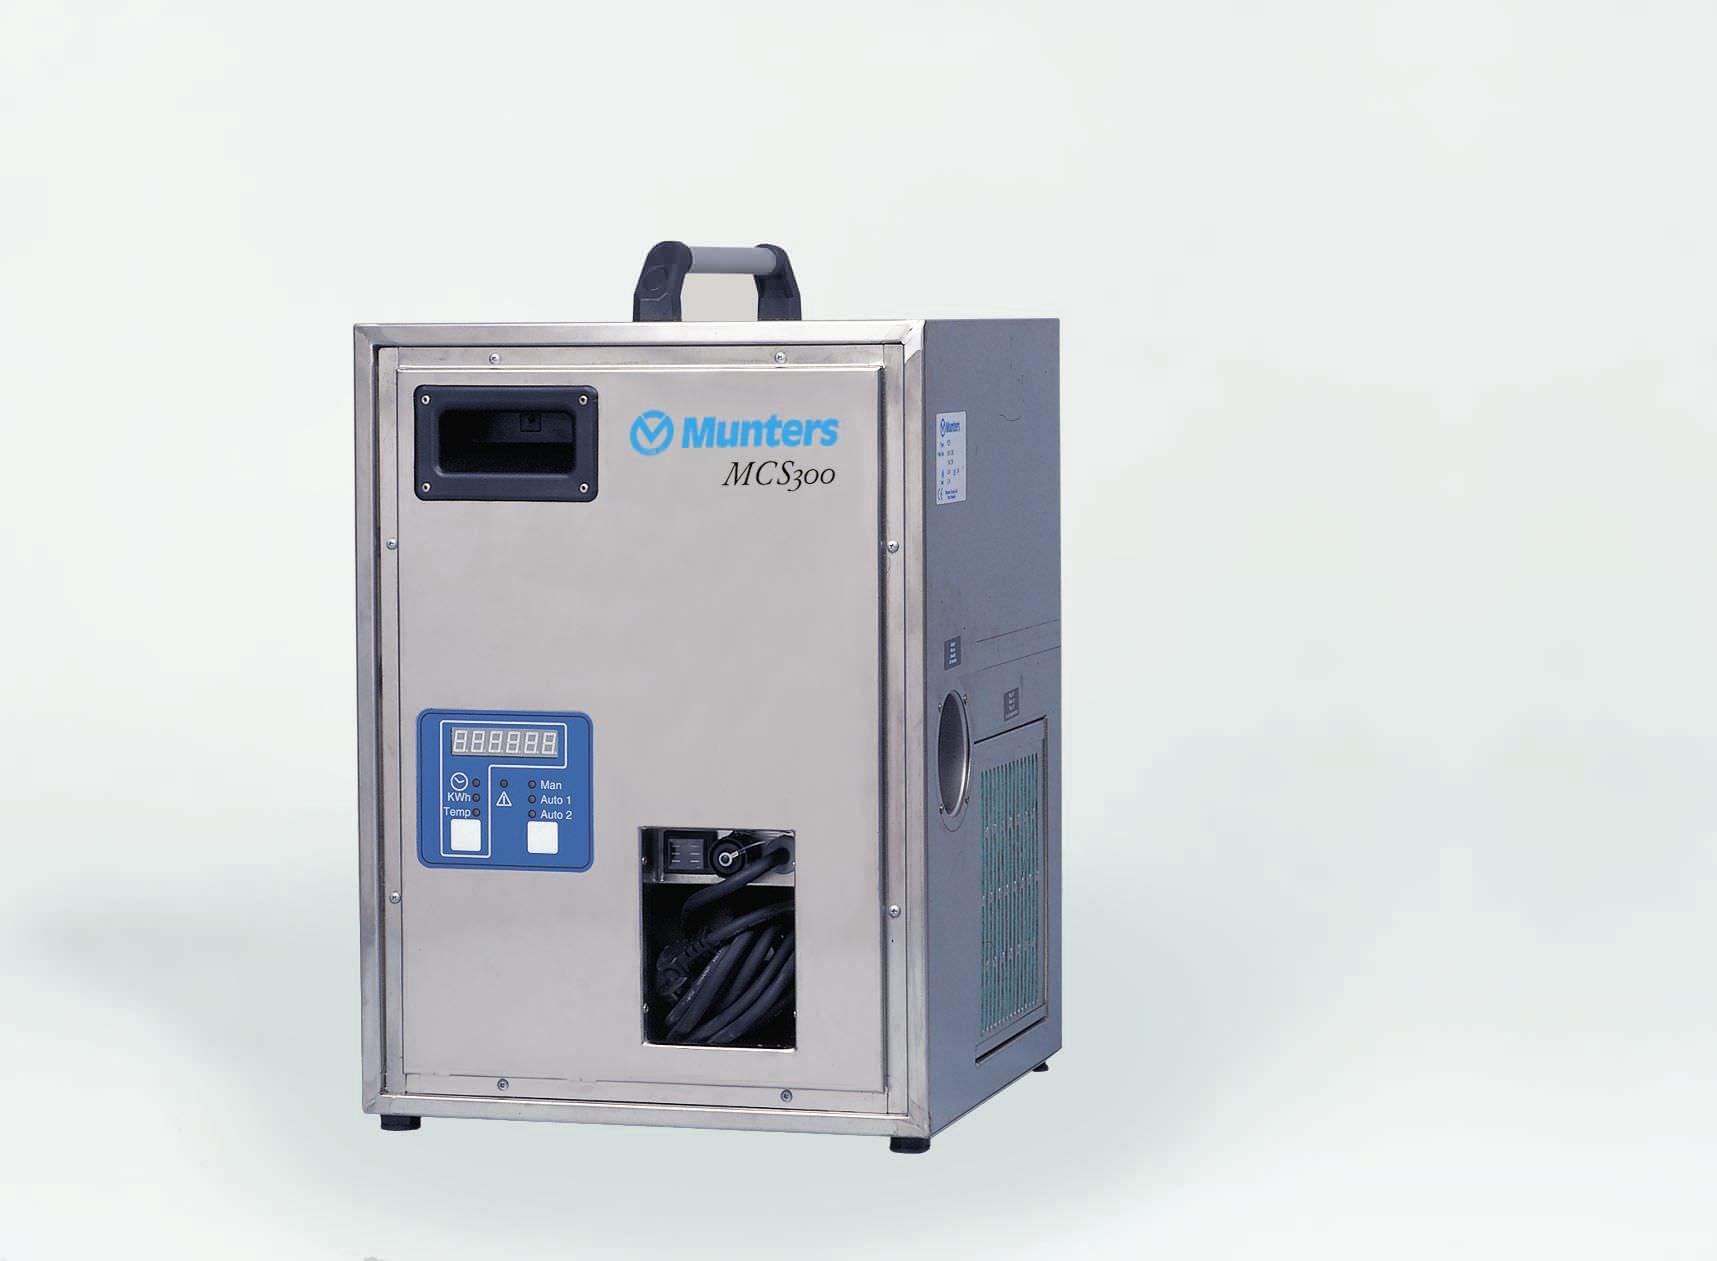 hight resolution of munters dehumidifiers array desiccant dehumidifier stationary air 60 300 m h mcs300 rh directindustry com